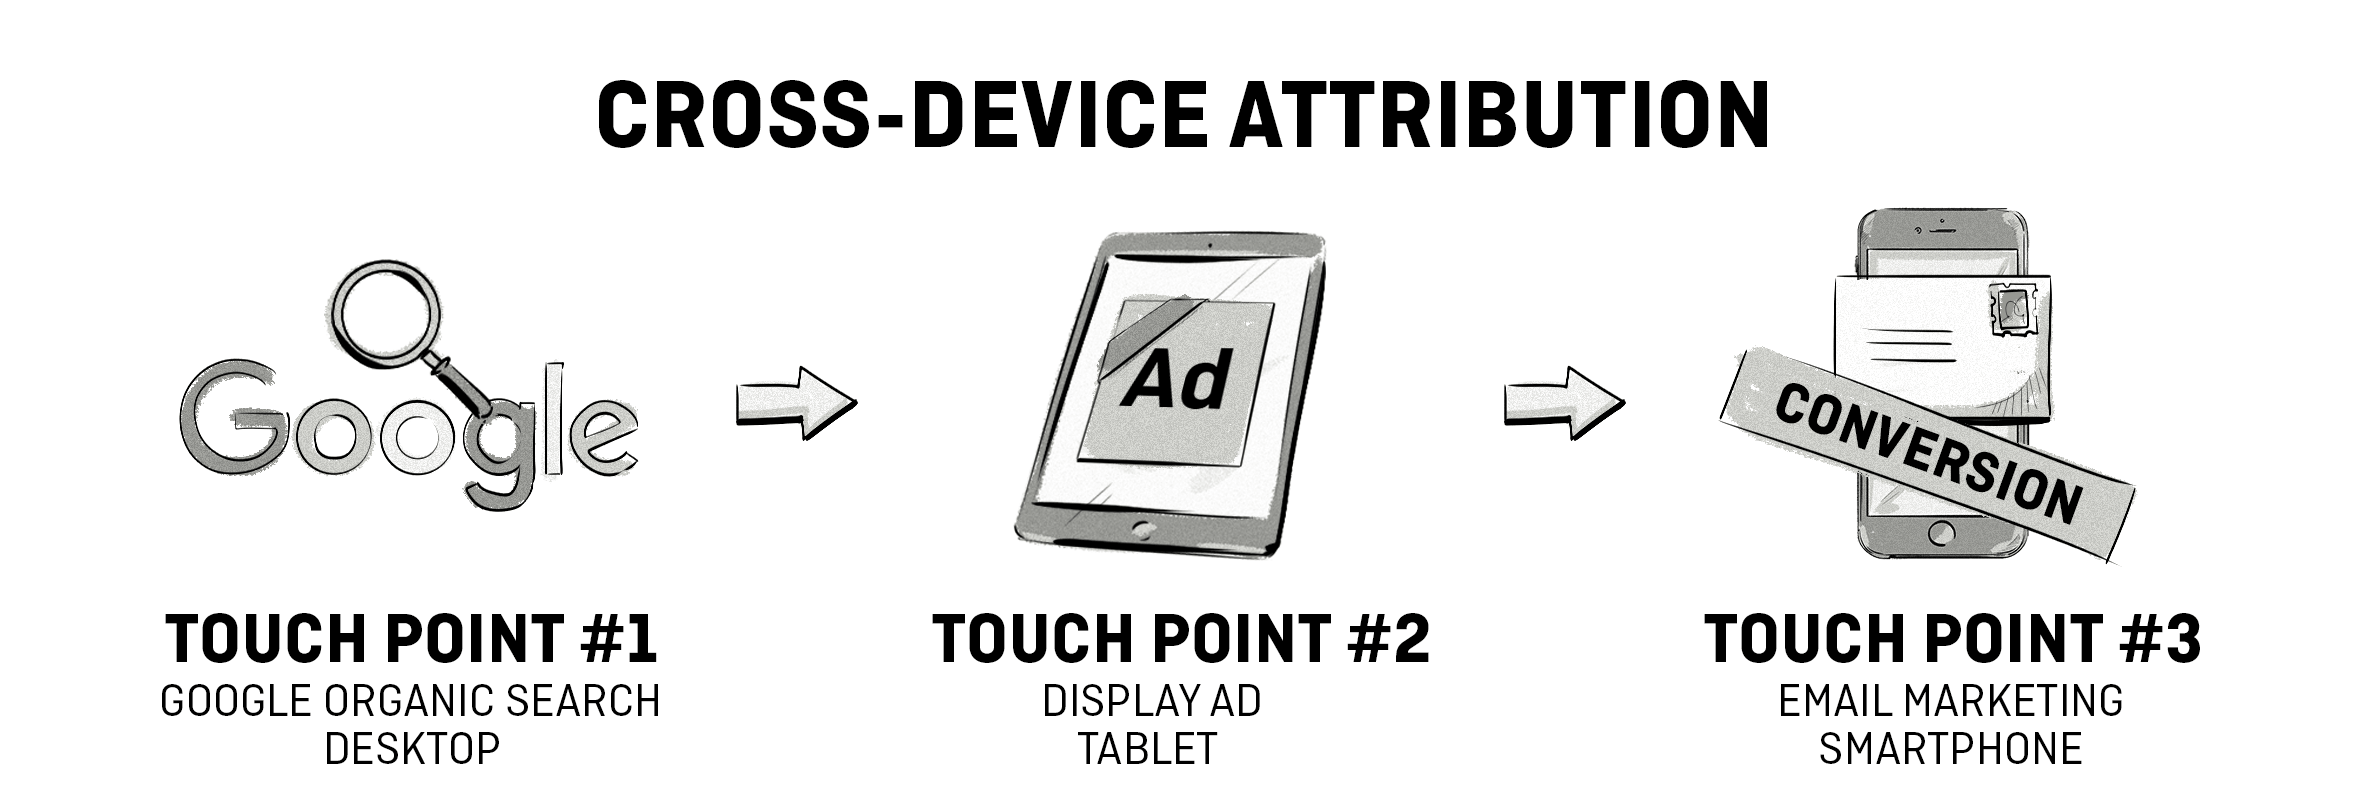 cross-device attribution